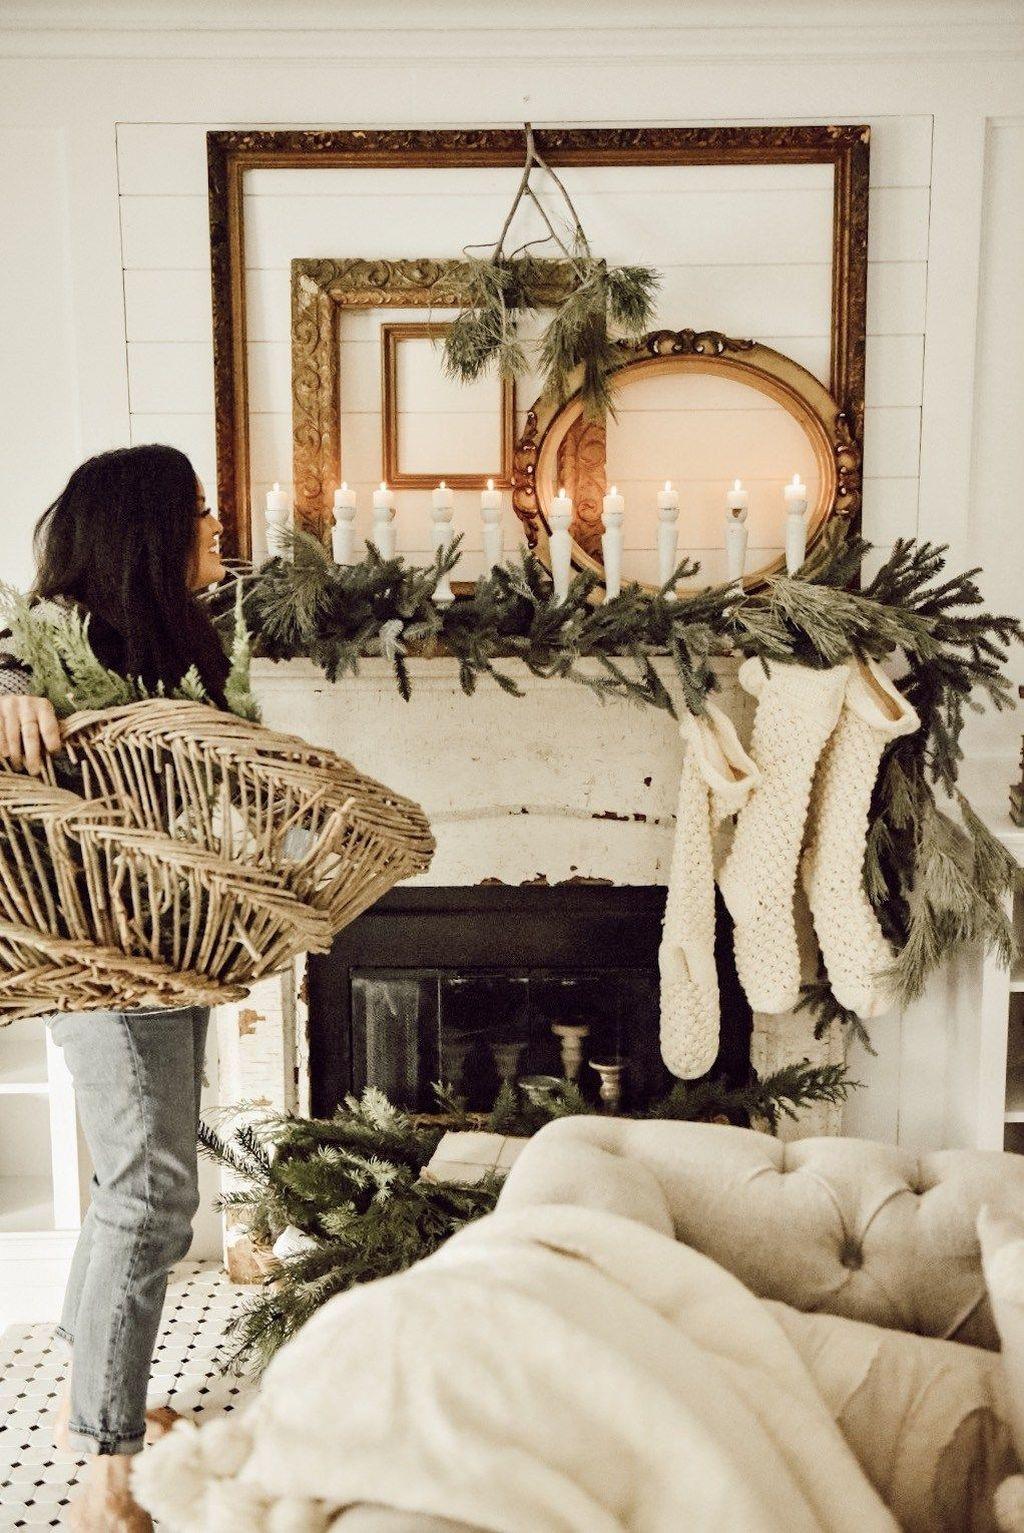 Unordinary Christmas Home Decor Ideas 32